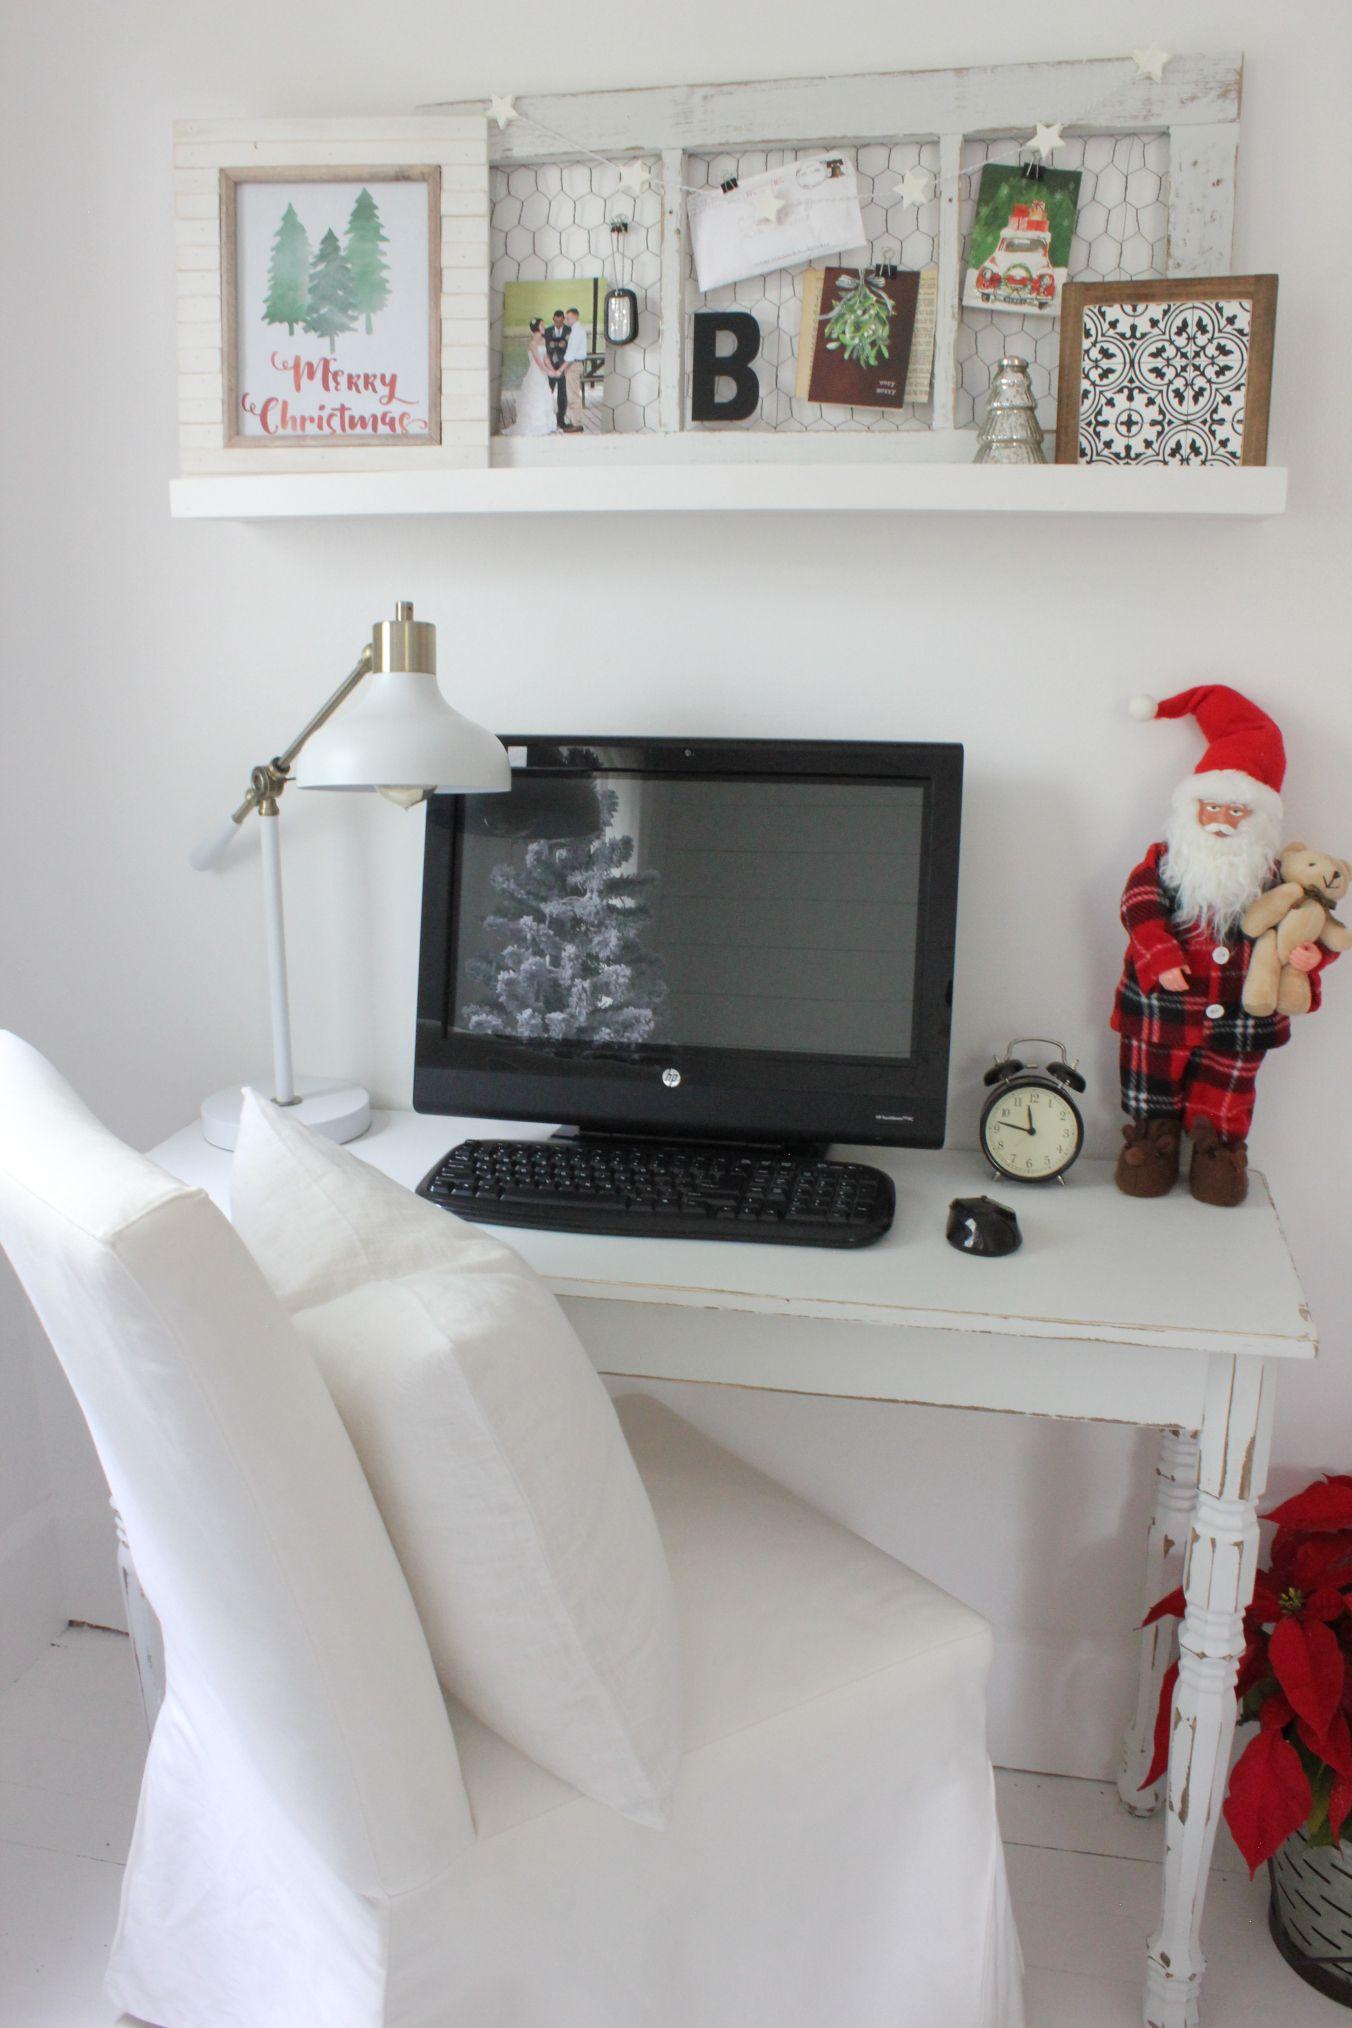 DIY old window chicken wire memo board above desk | DIY Craftiness ...